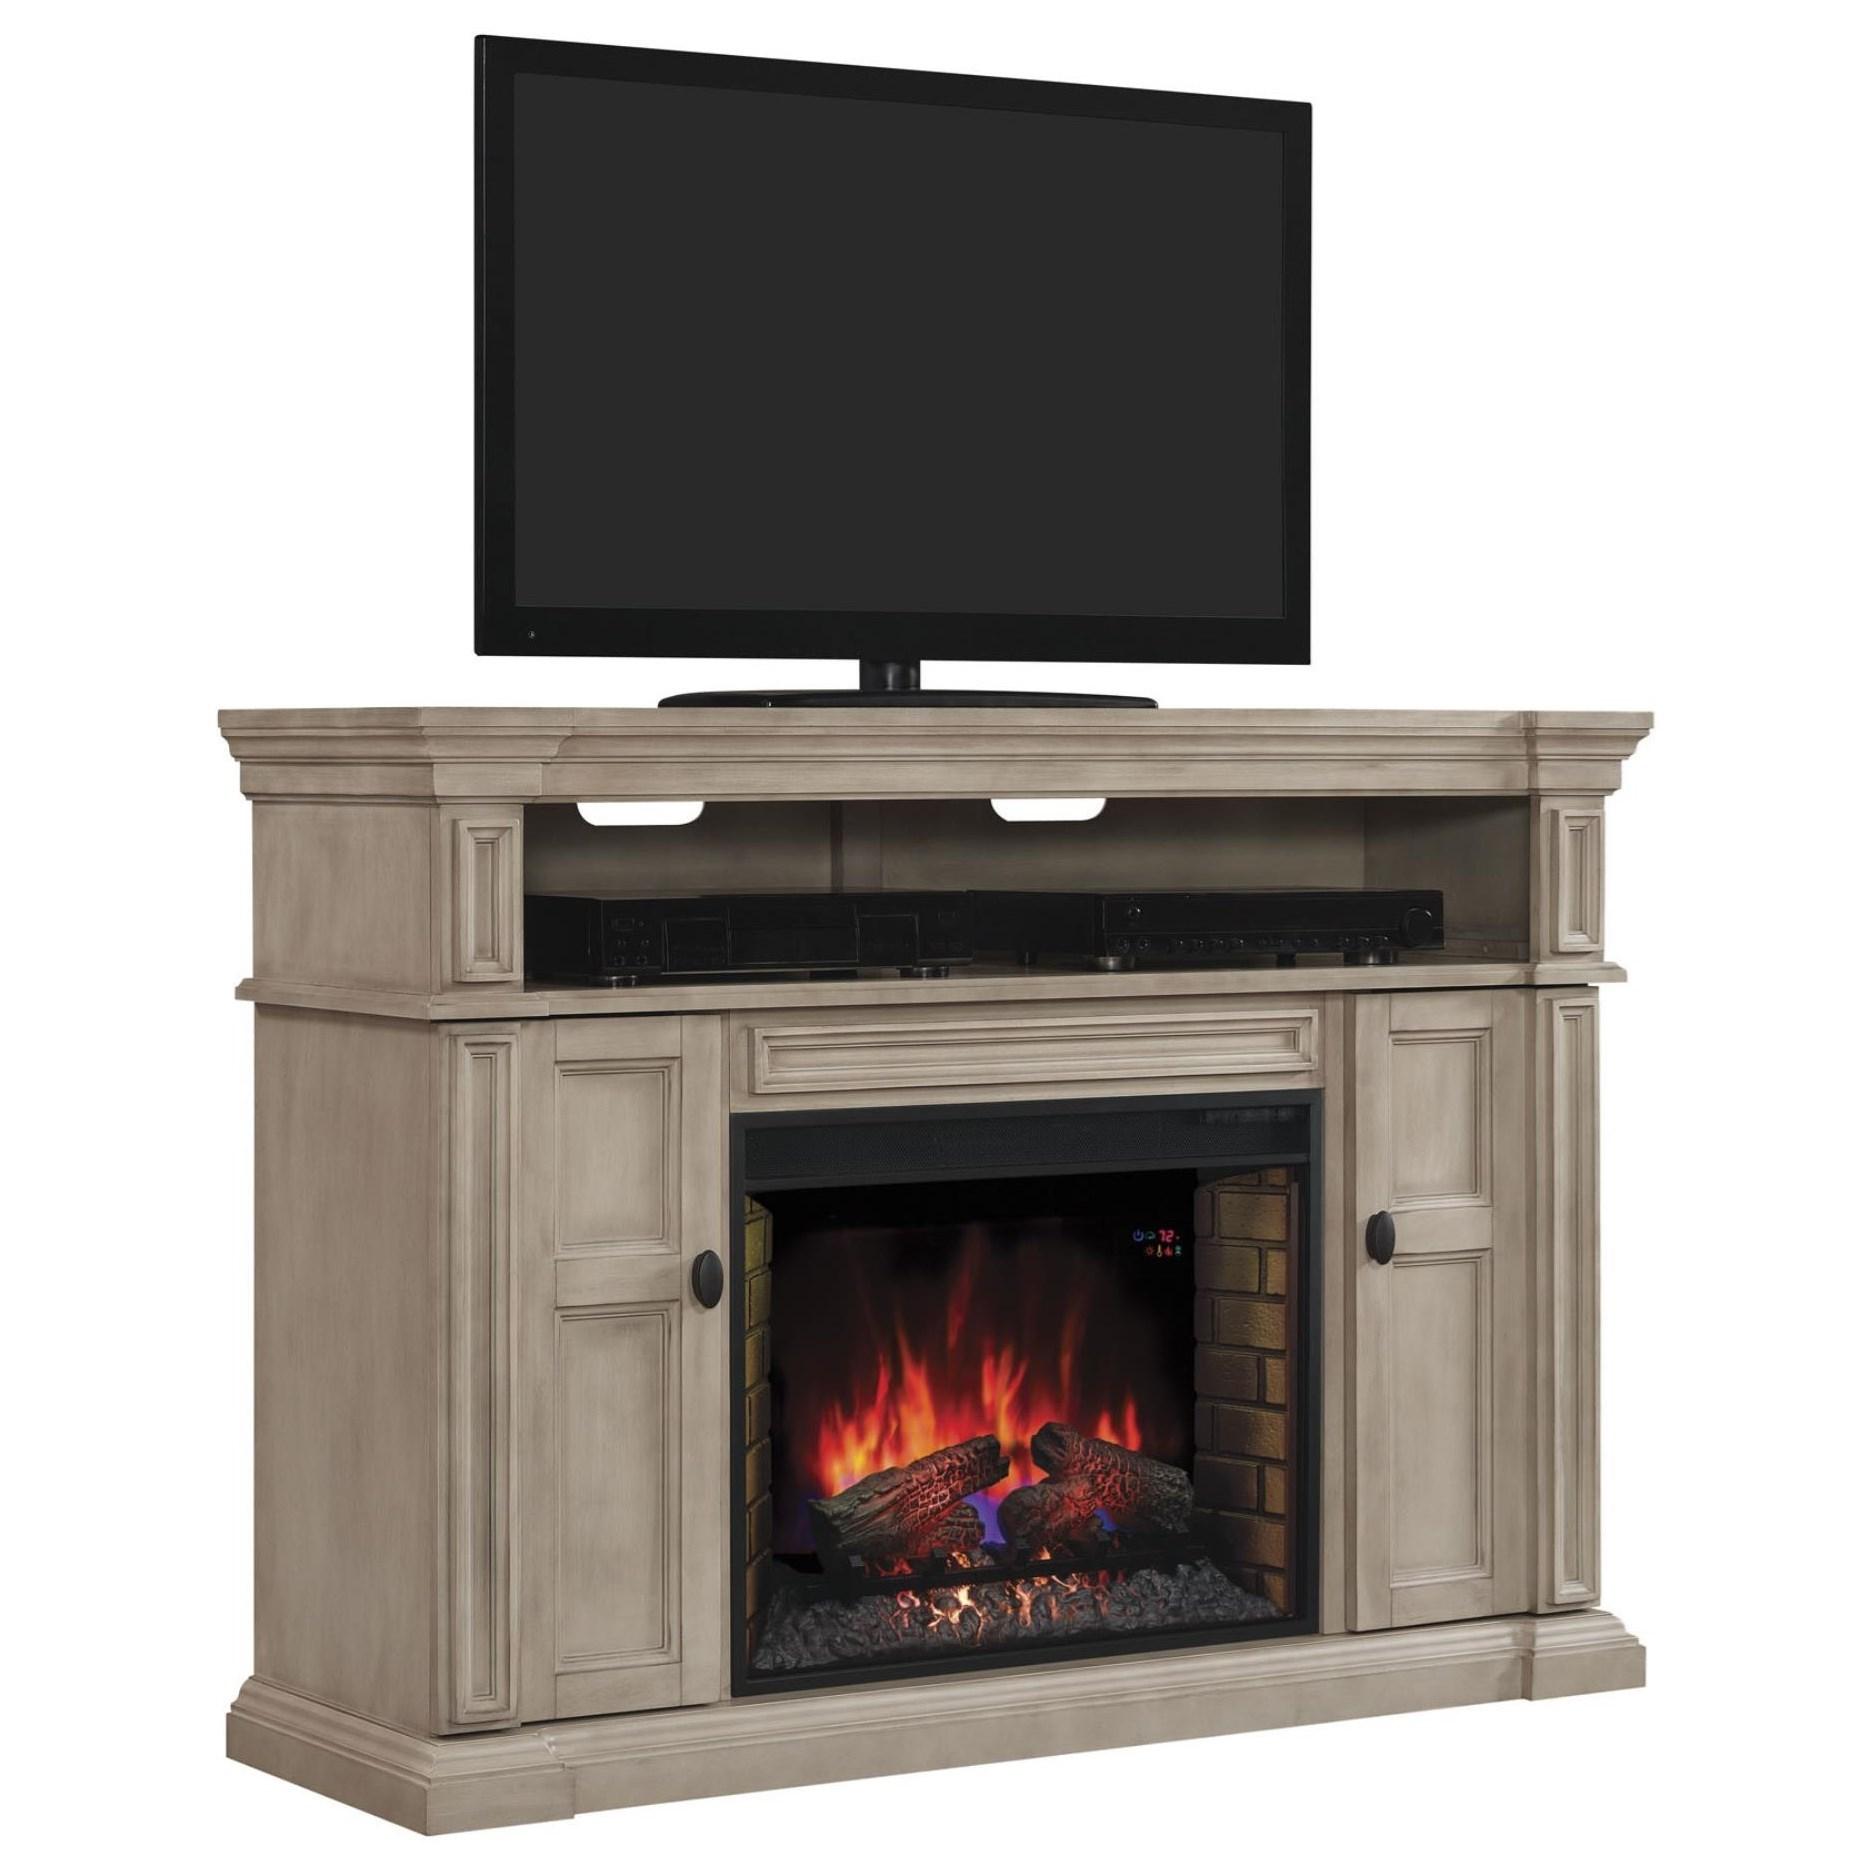 Wyatt Fireplace Tv Console Mantel Amp Fireplace Insert With